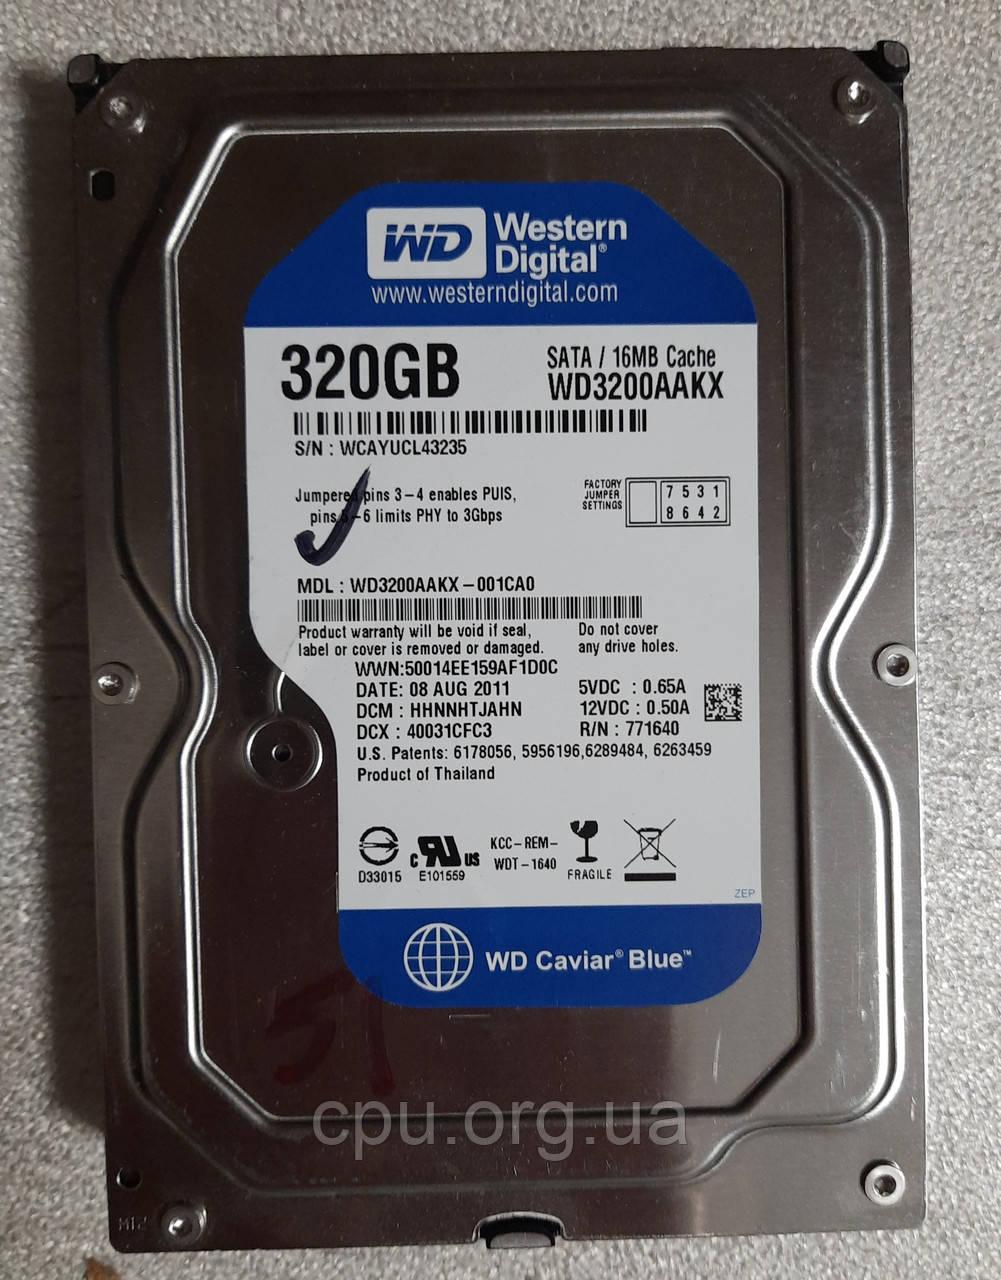 Жесткий диск HDD 3.5 320GB WD WD3200AAKX 16M 7200 об/мин SATA III